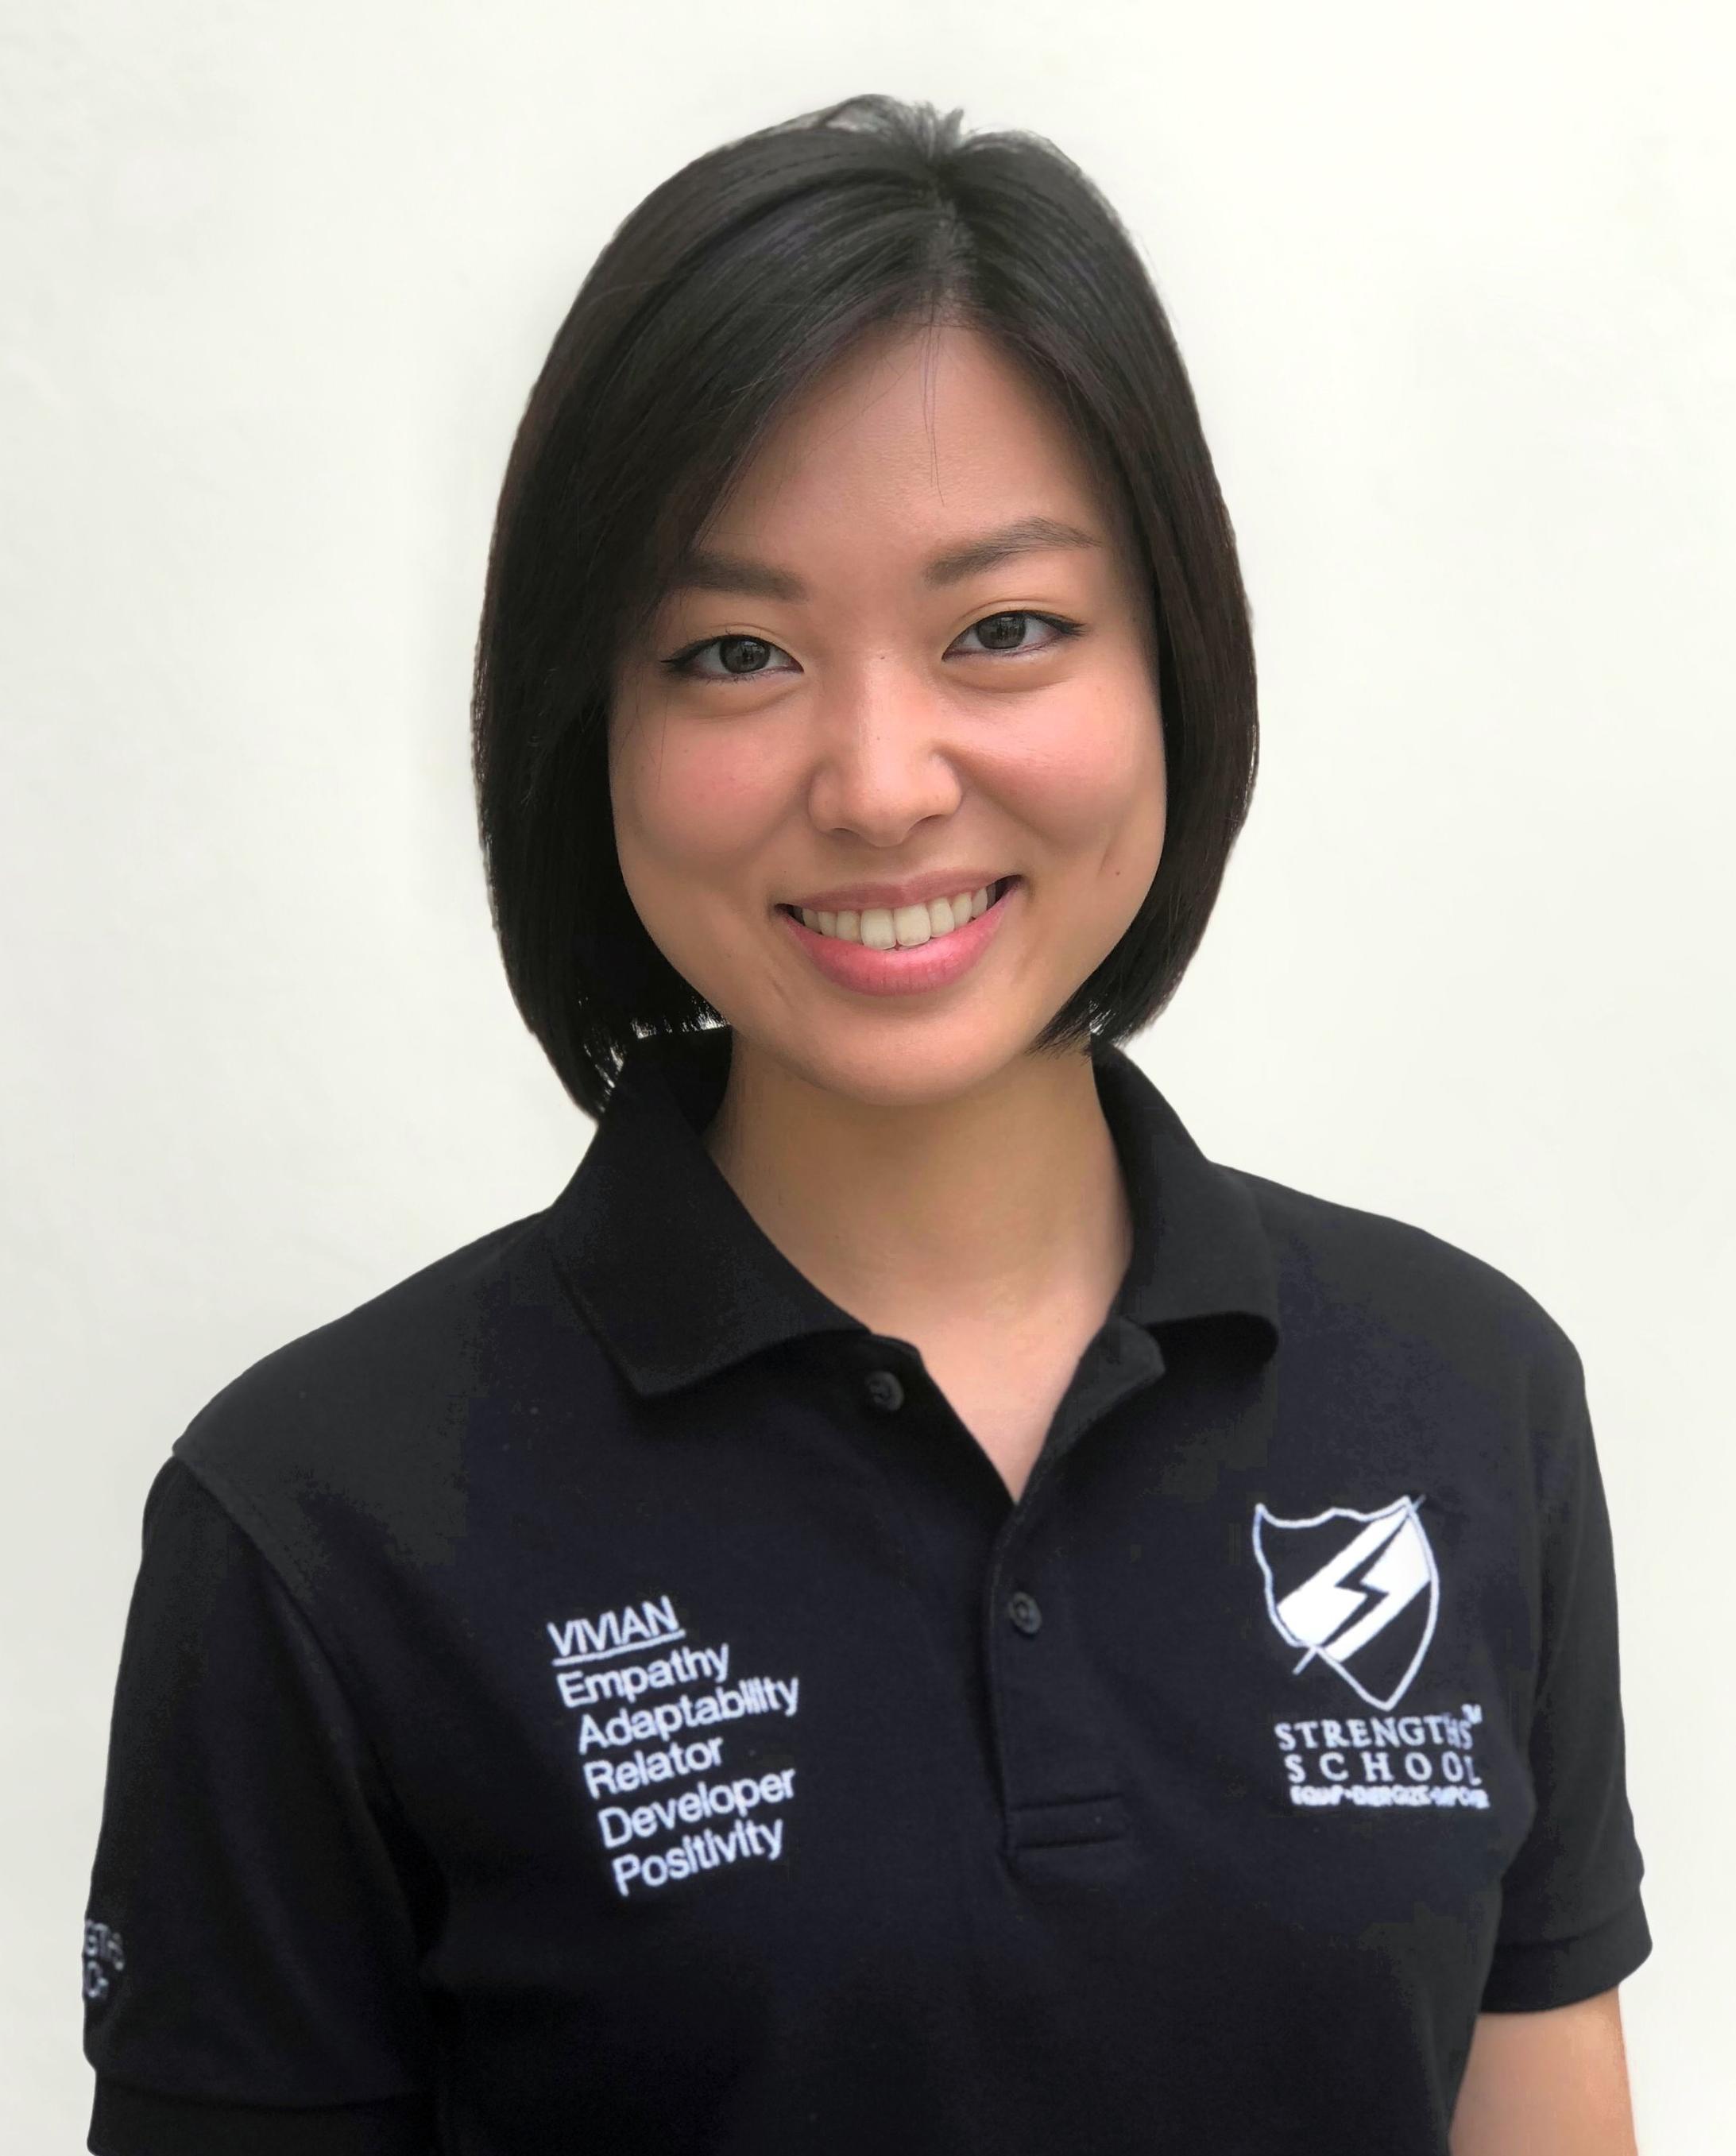 Vivian+Liang+Strengths+School+Singapore+StrengthsFinder CliftonStrengths Education Sector.png